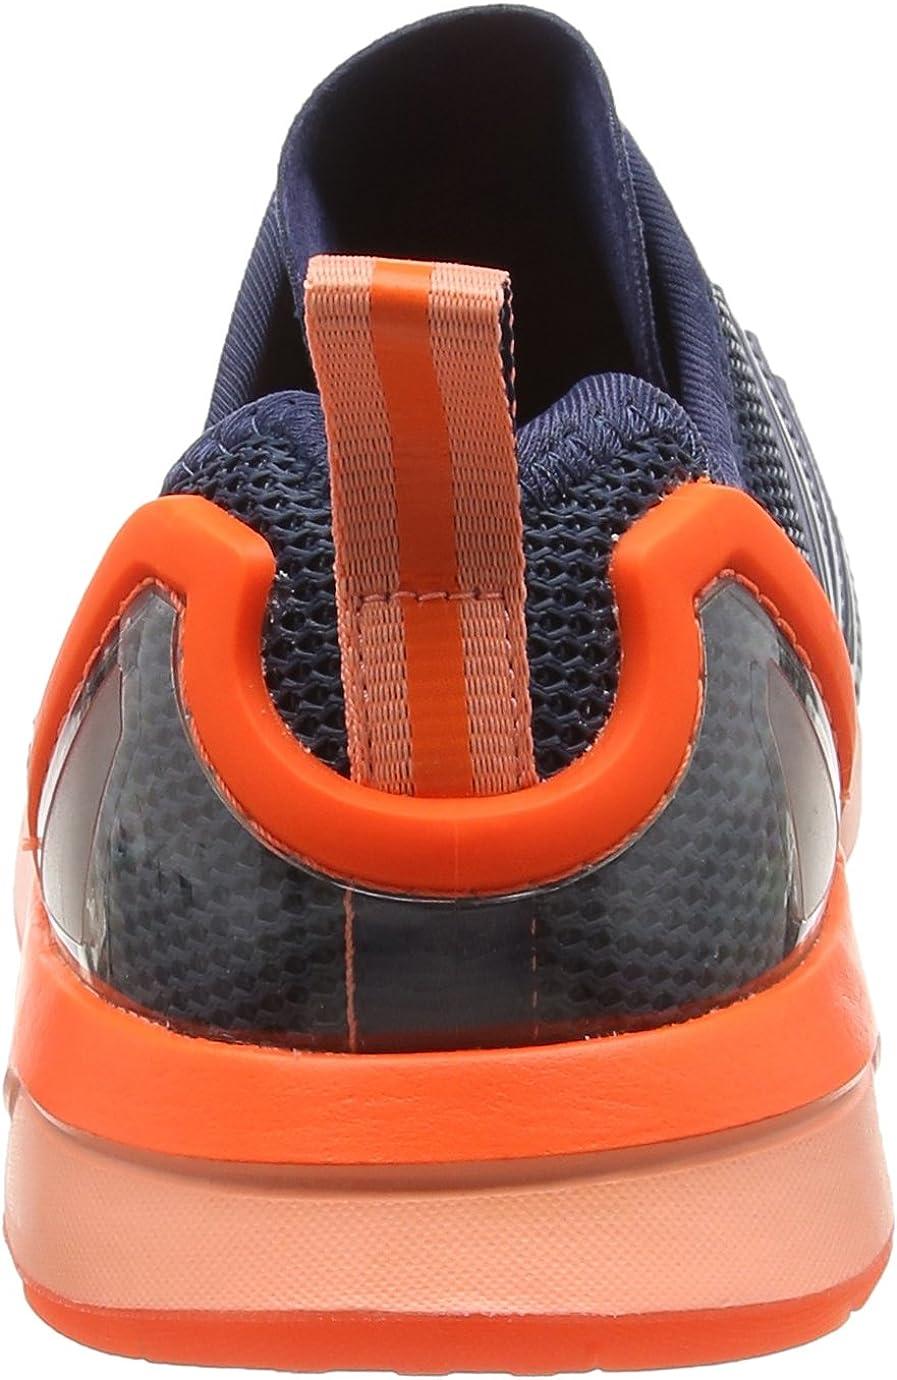 ADIDAS ORIGINALS Zx Flux ADV Blau (Mini Blue/Mini Blue/Solar Orangemini Blue/Mini Blue/Solar Orange)